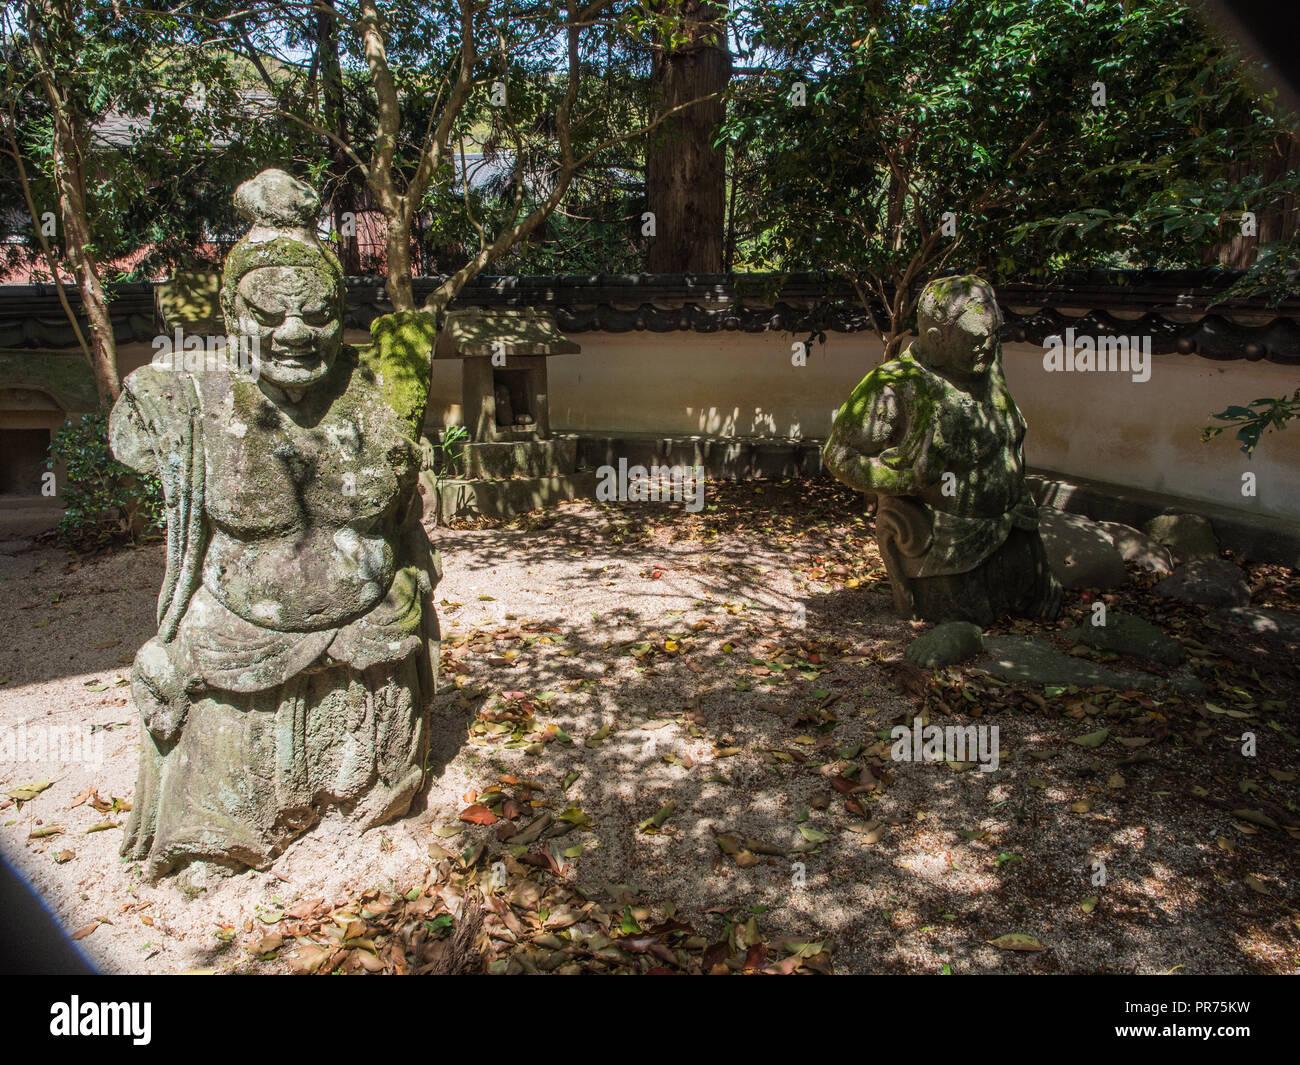 Nio temple guardians, crippled by decay, limbless torsos, at a local shinto shrine, Kunisaki Hanto, Oita, Kyushu, Japan - Stock Image